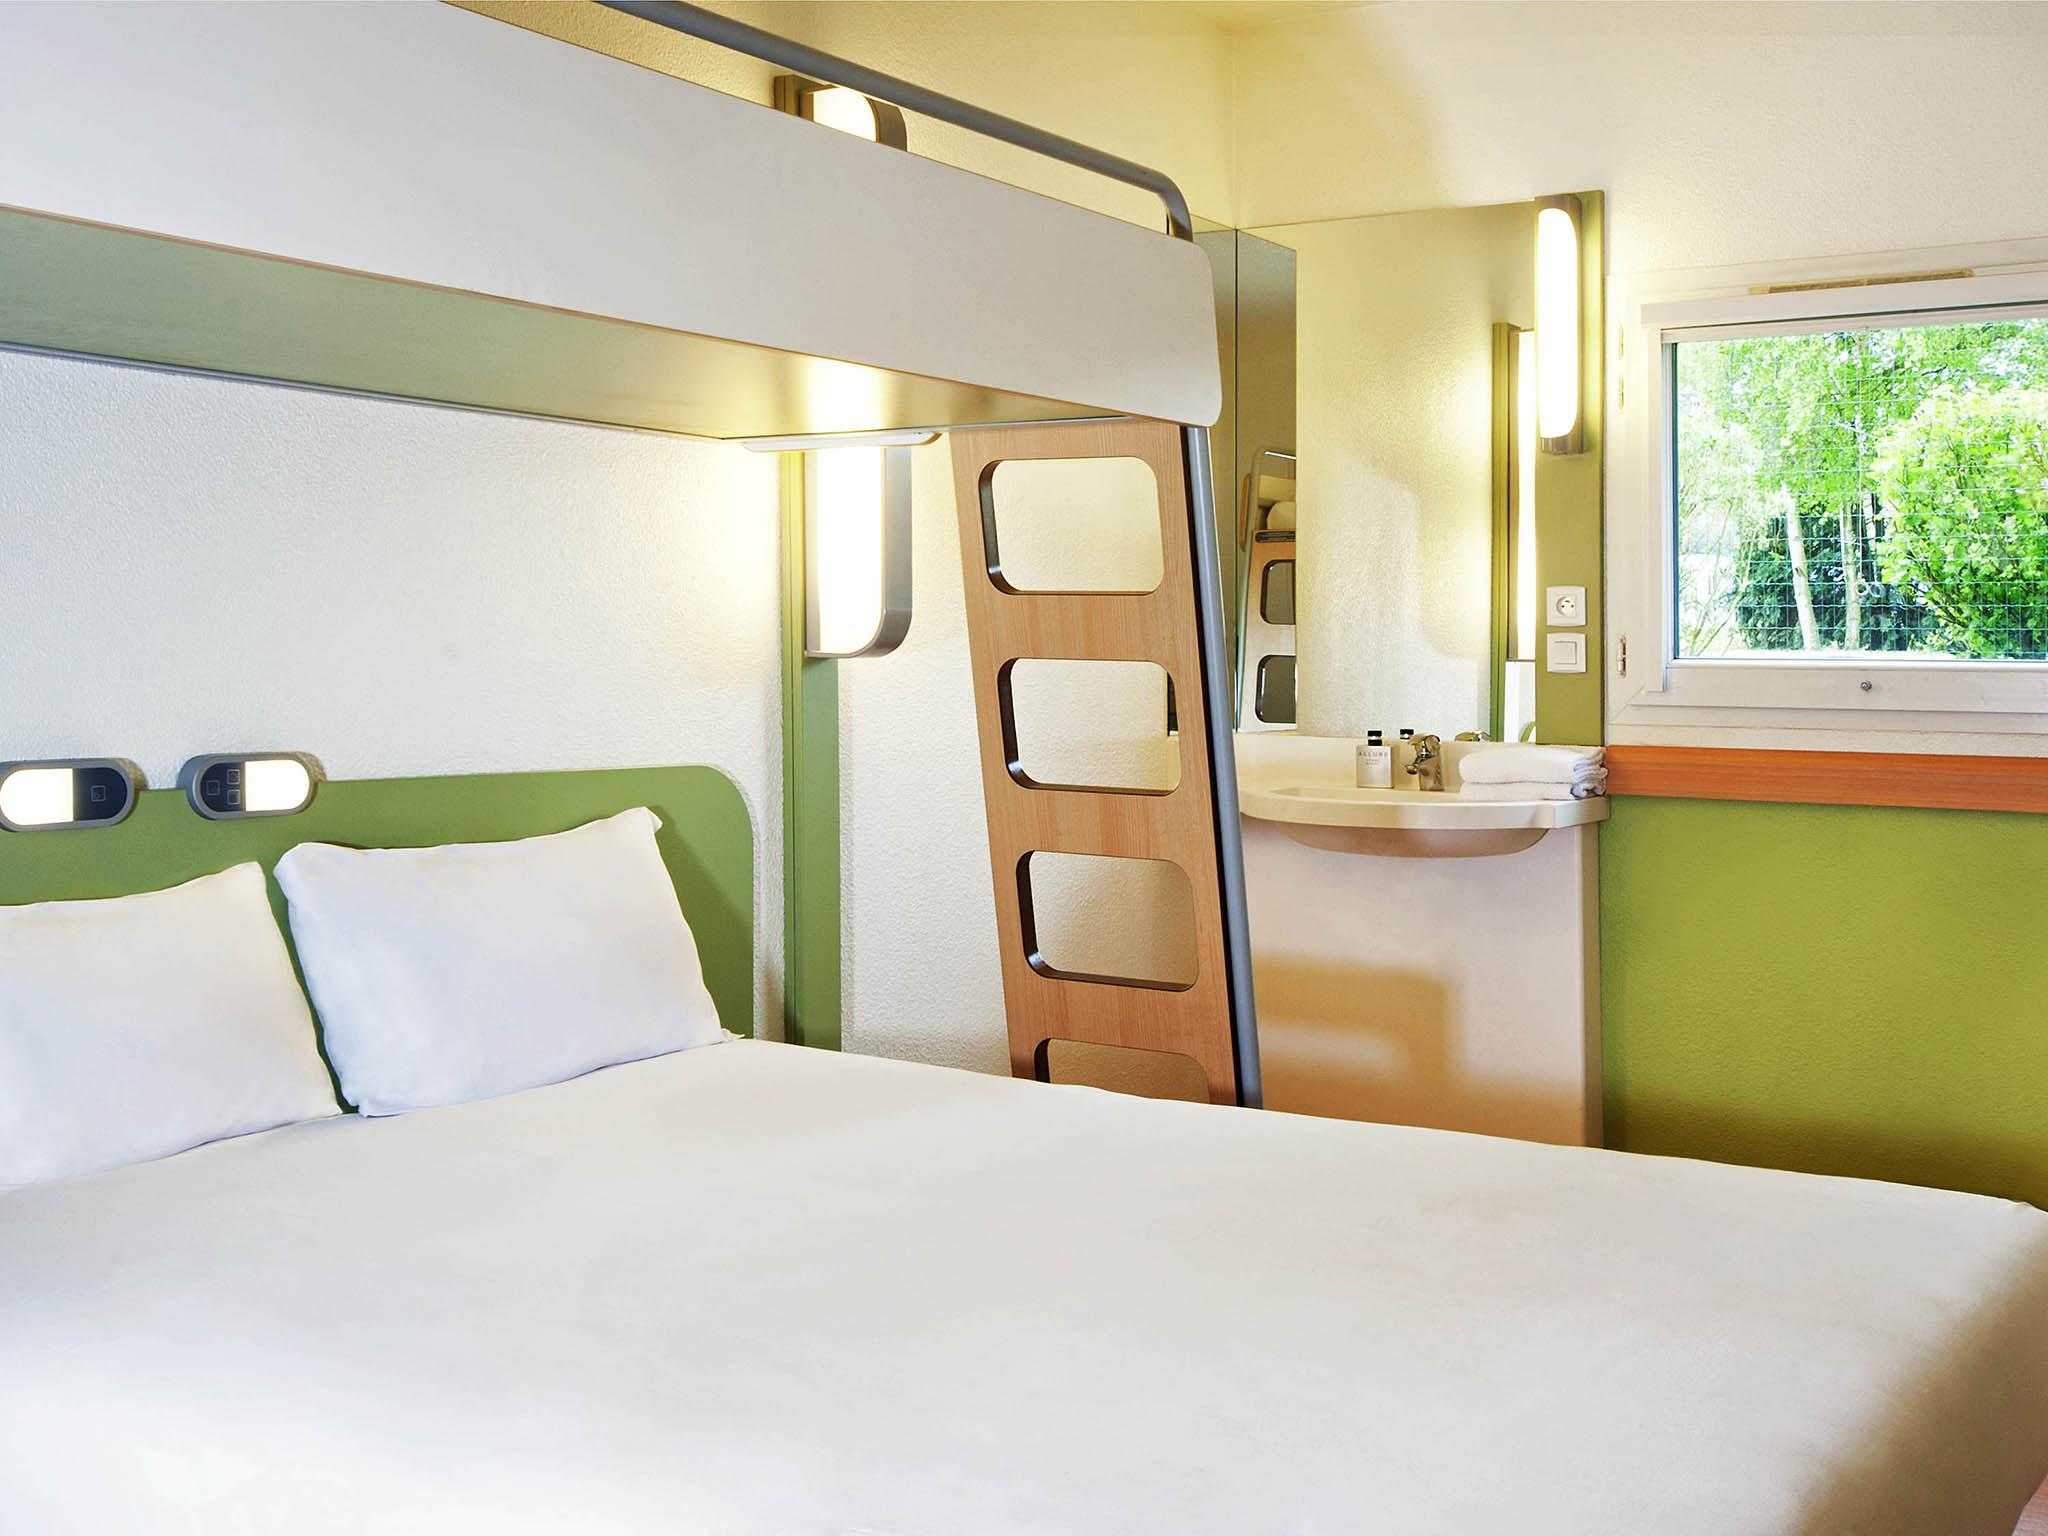 Hotel in honfleur ibis budget honfleur centre ville for Chambre communicante